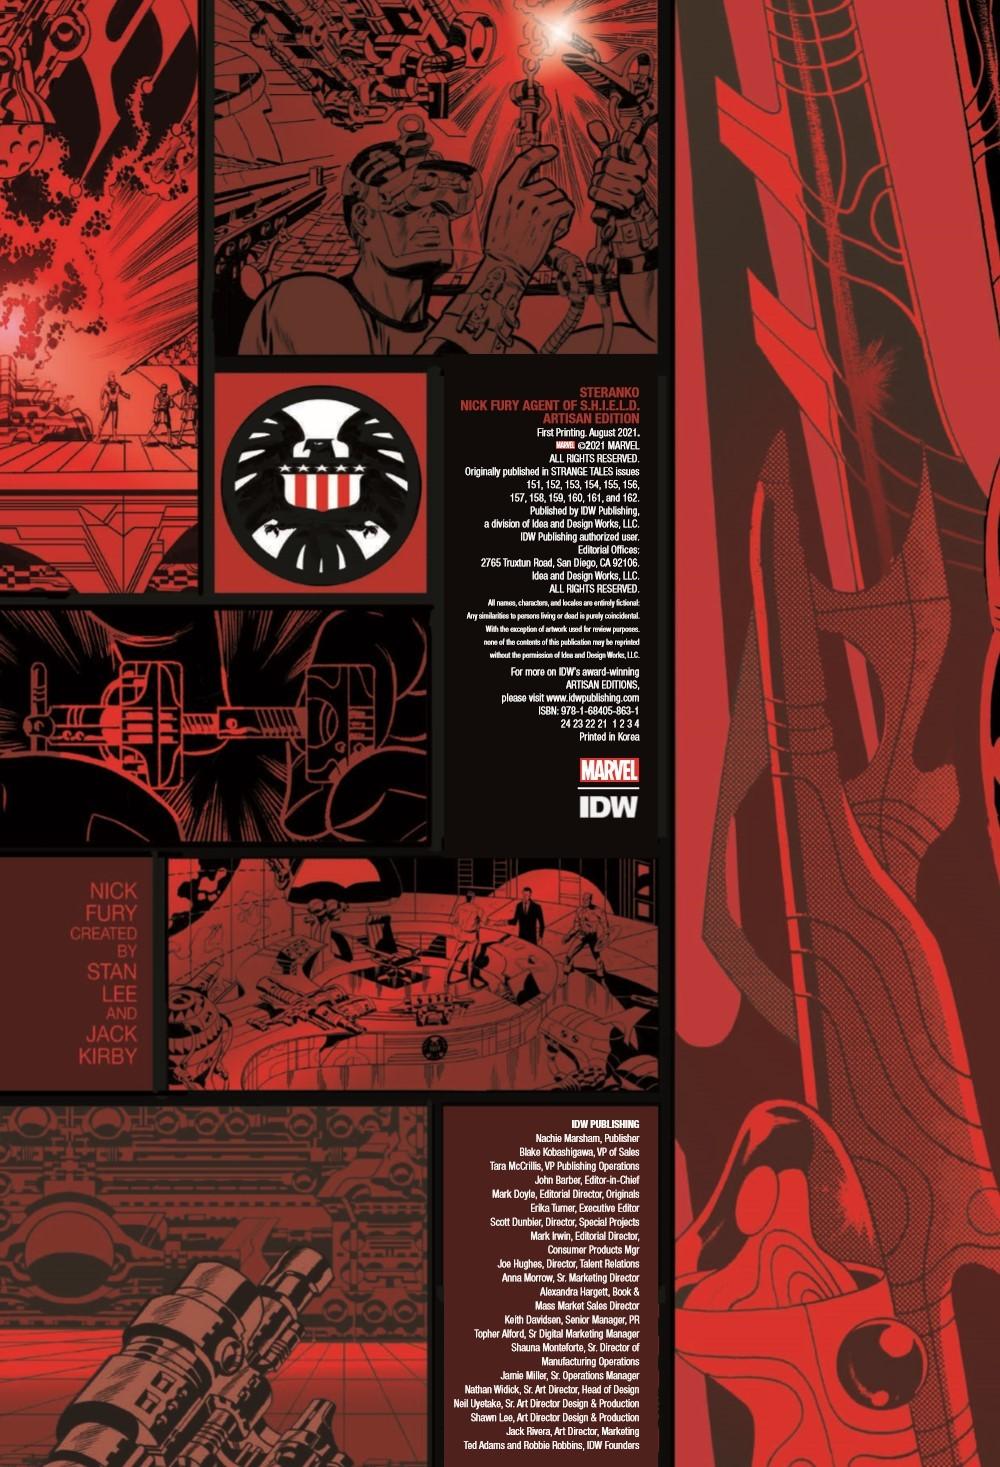 STERANKO_artisan_edition_pr-2 ComicList Previews: JIM STERANKO'S NICK FURY AGENT OF S.H.I.E.L.D. ARTISAN EDITION TP